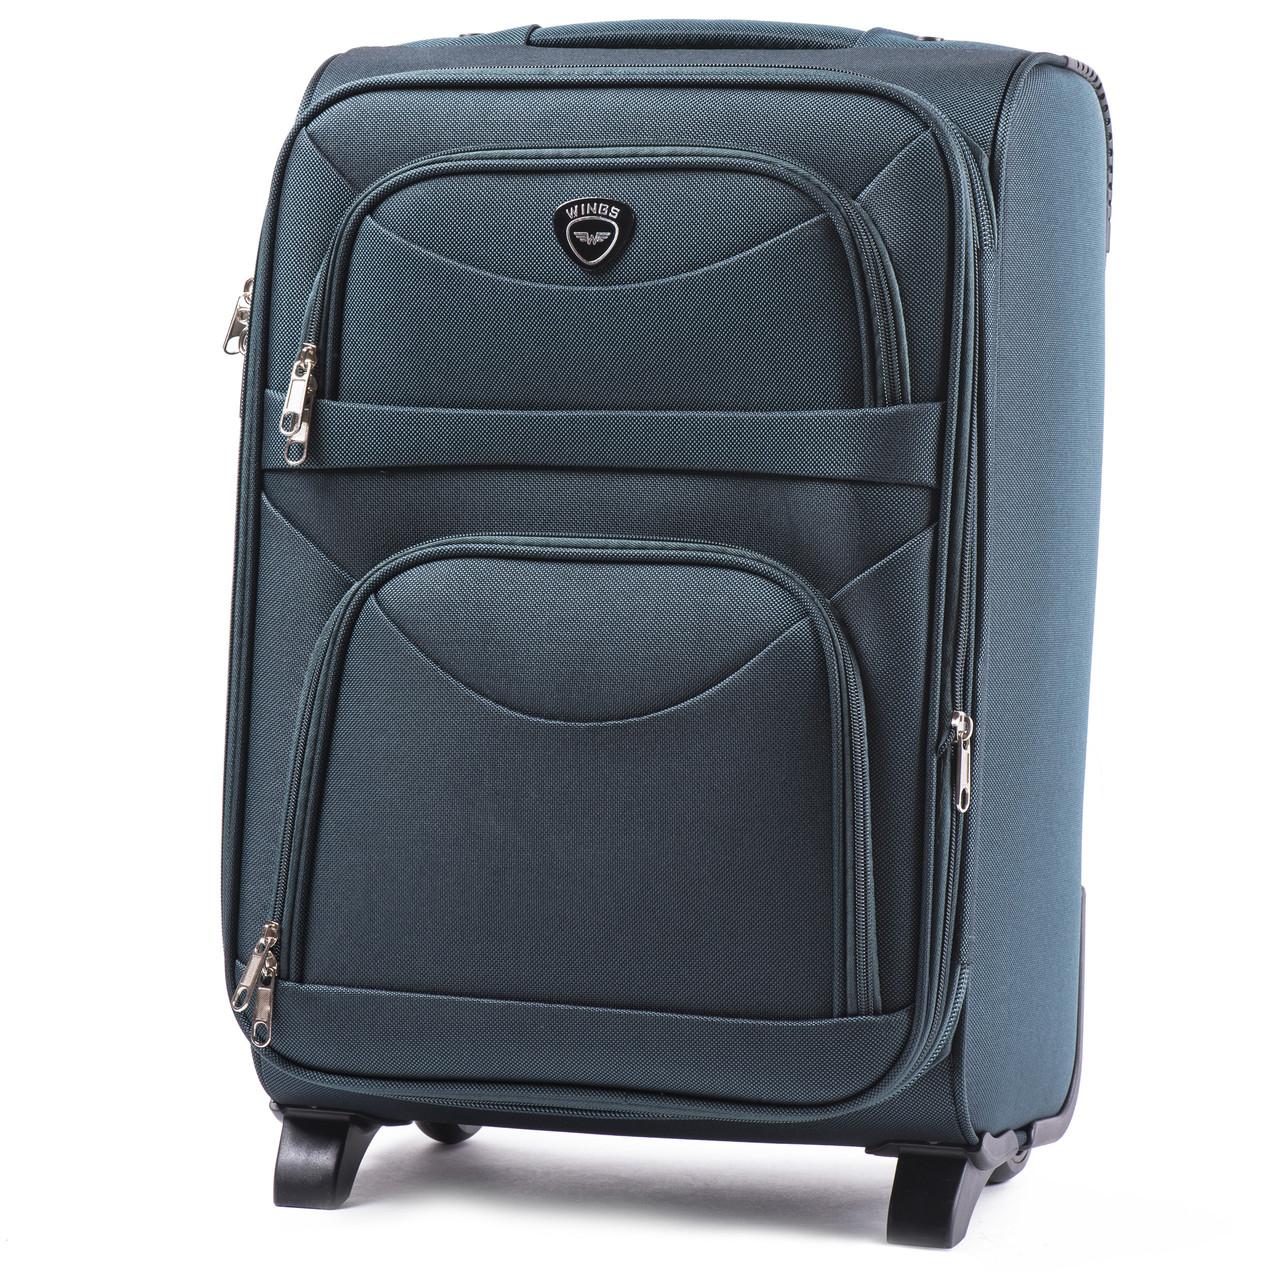 Средний тканевый чемодан Wings 6802 на 2 колесах зеленый